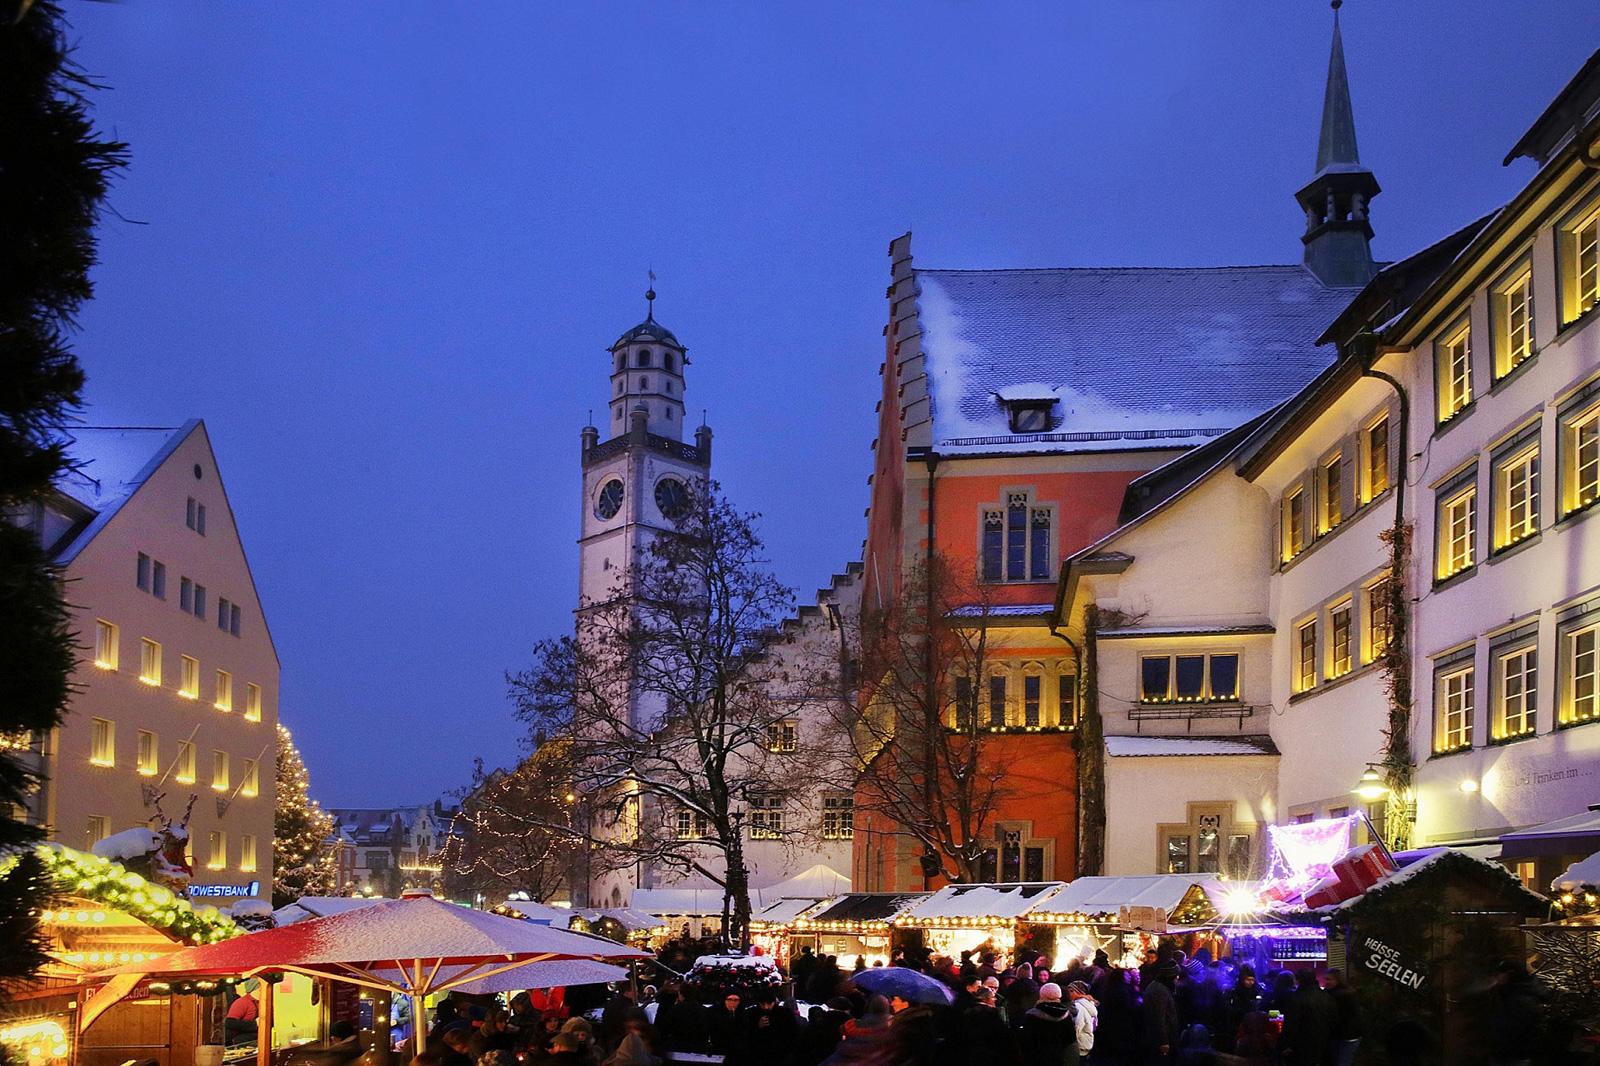 mercatino di natale a ravensburg